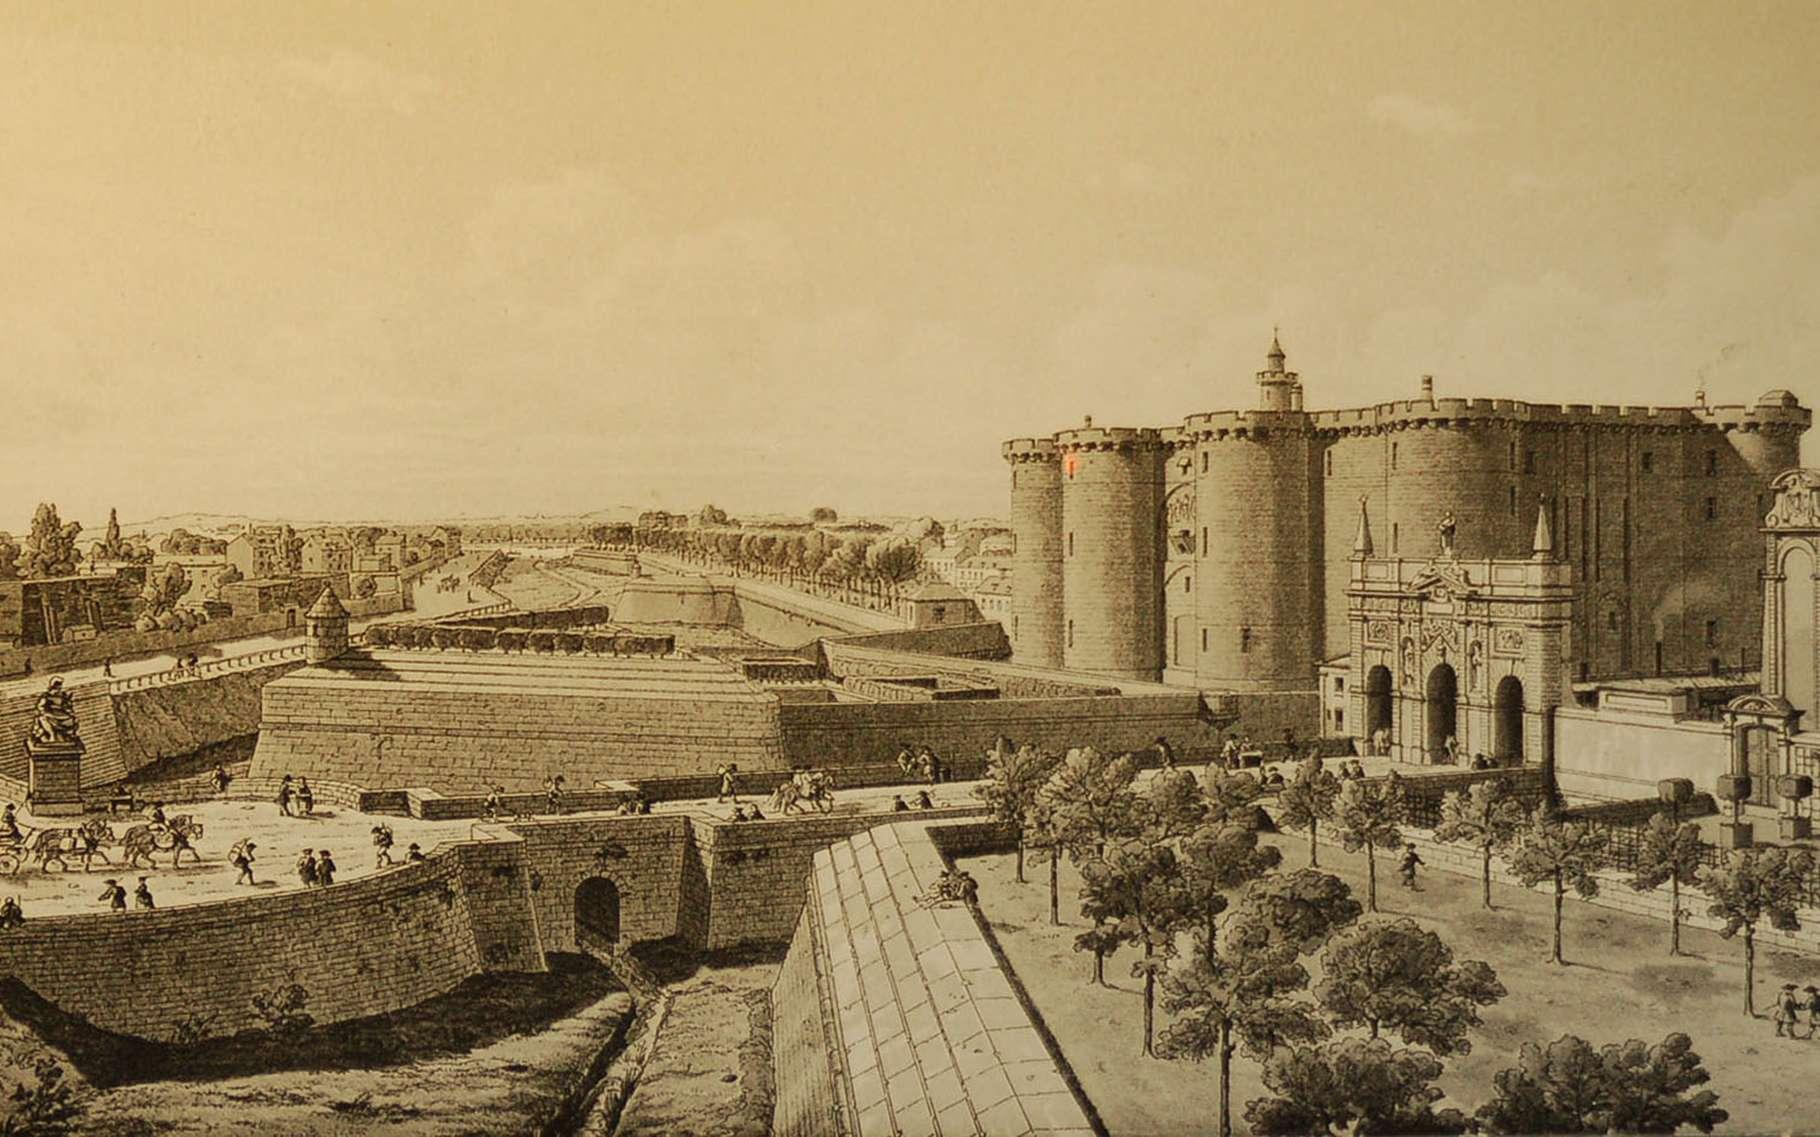 La Bastille avant sa destruction. © Wikimedia commons, DP